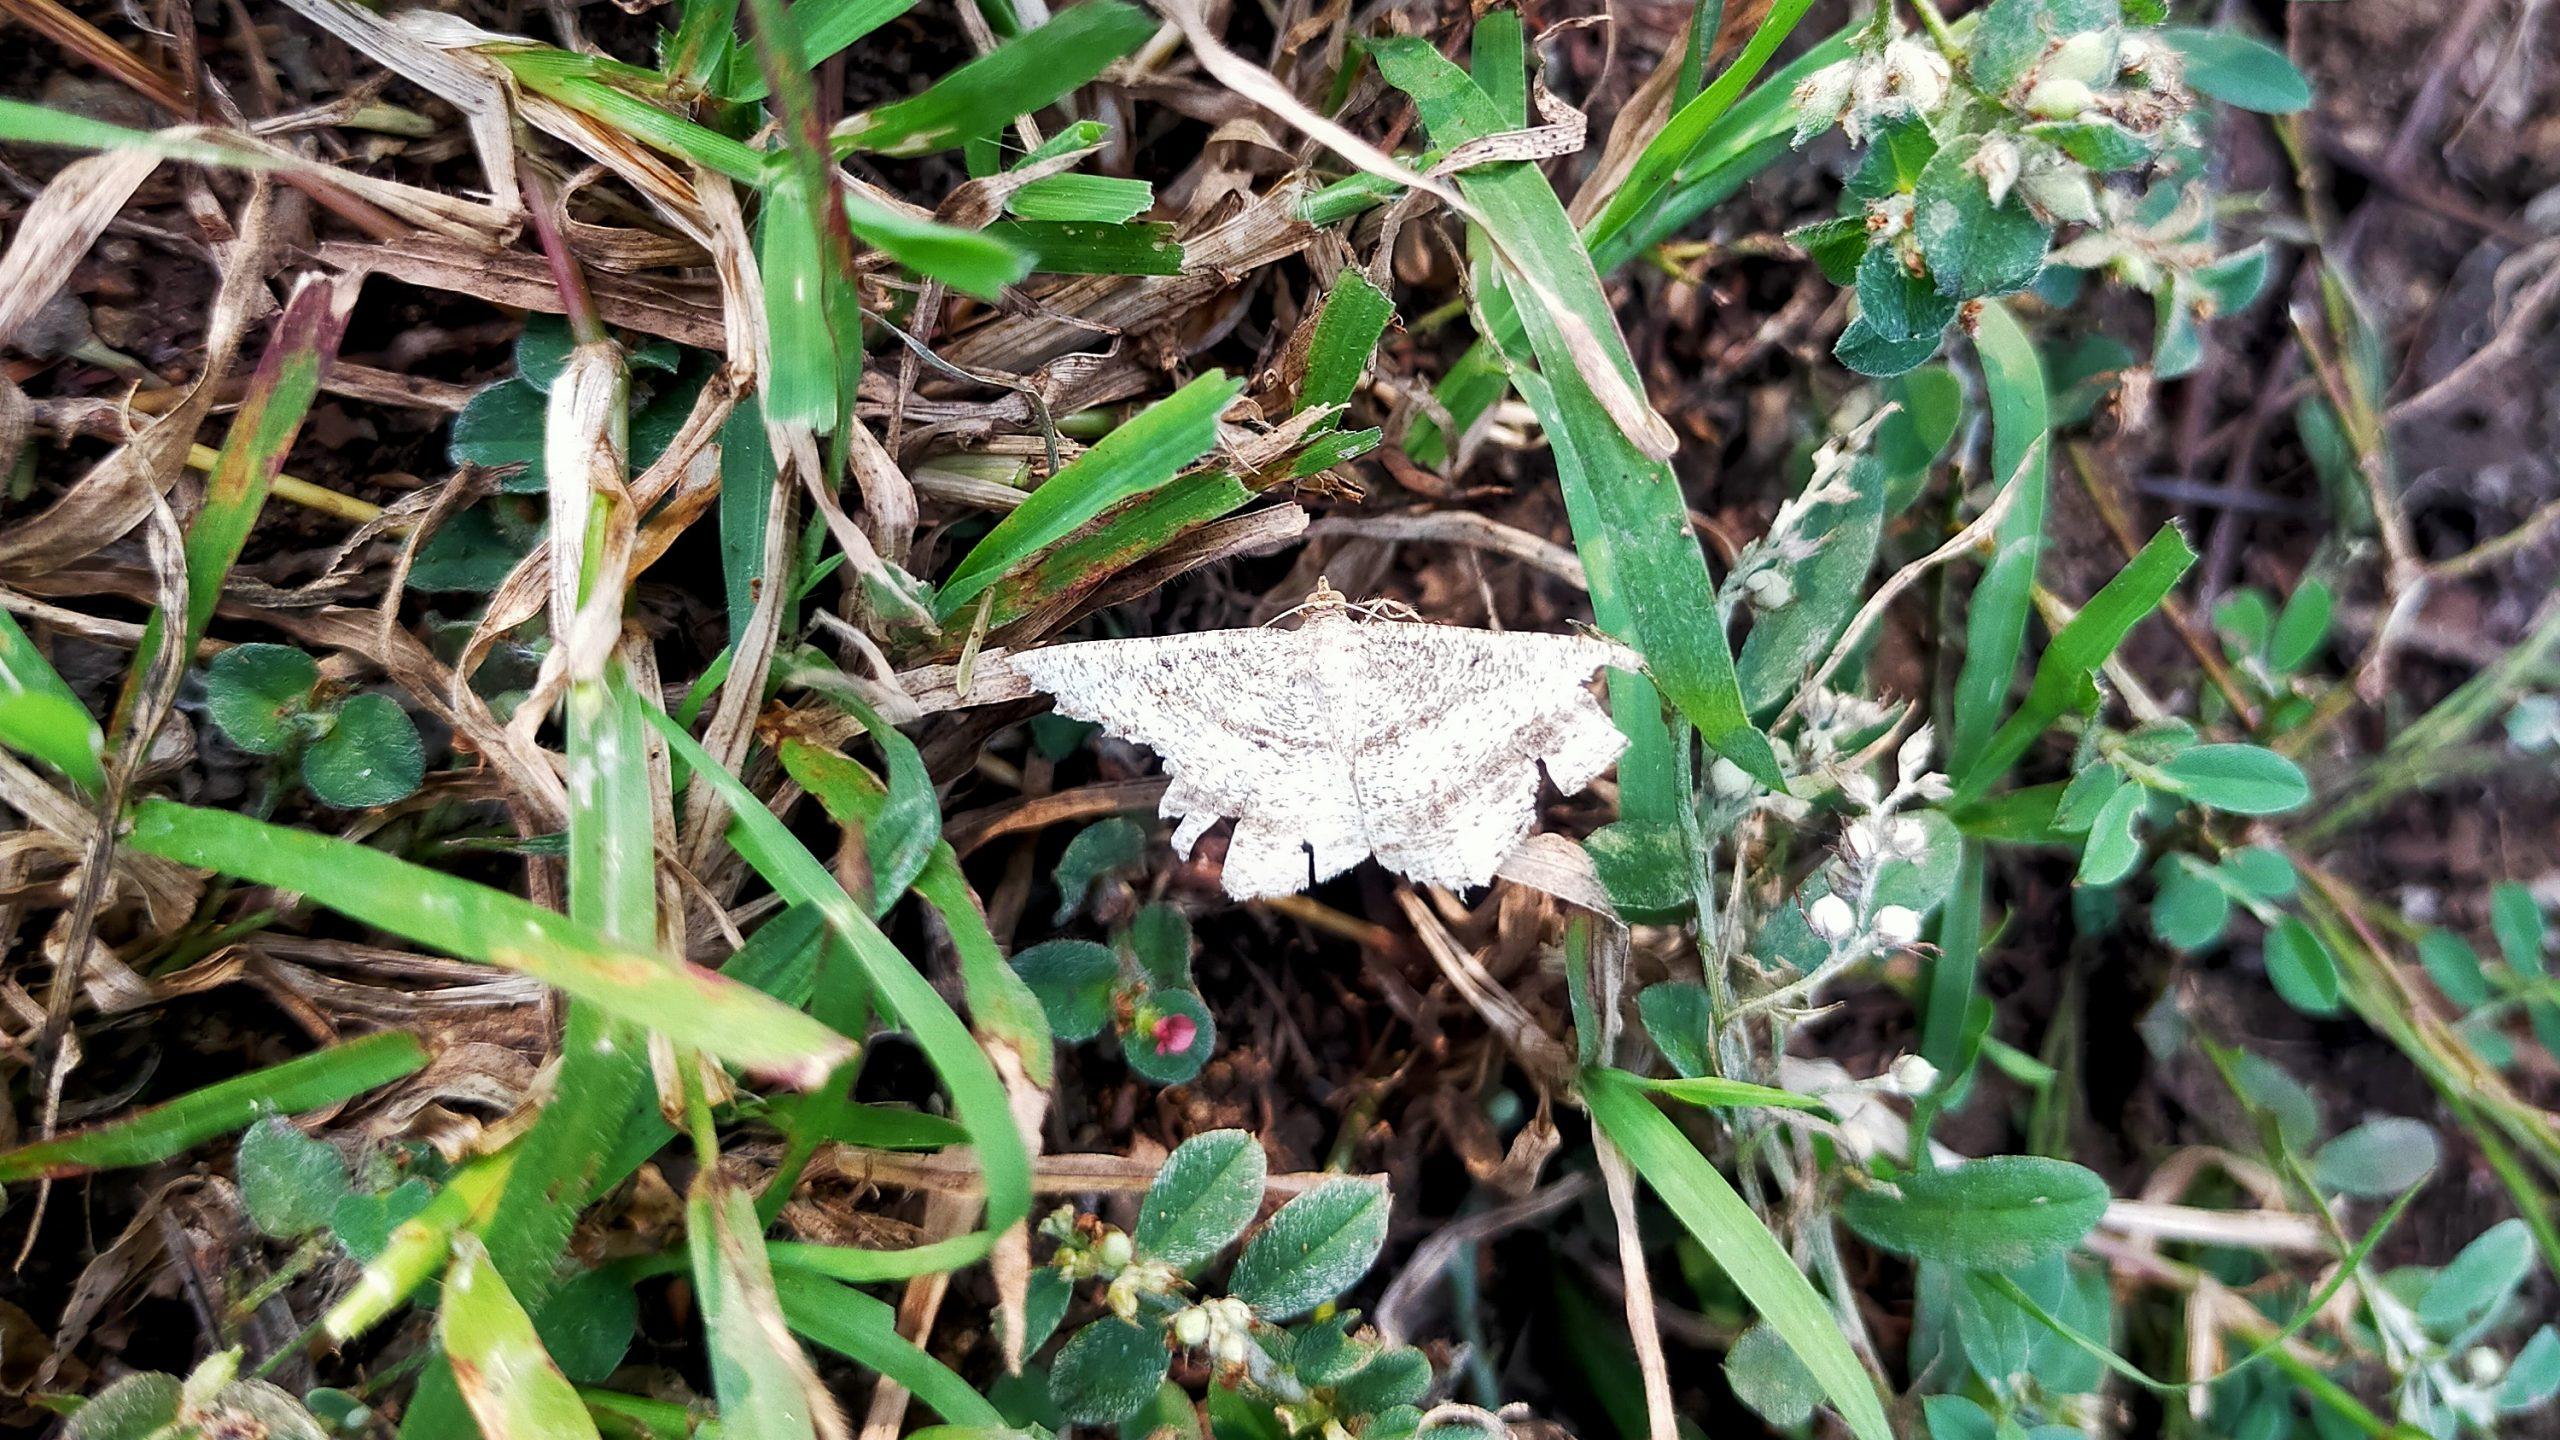 A butterfly on grass